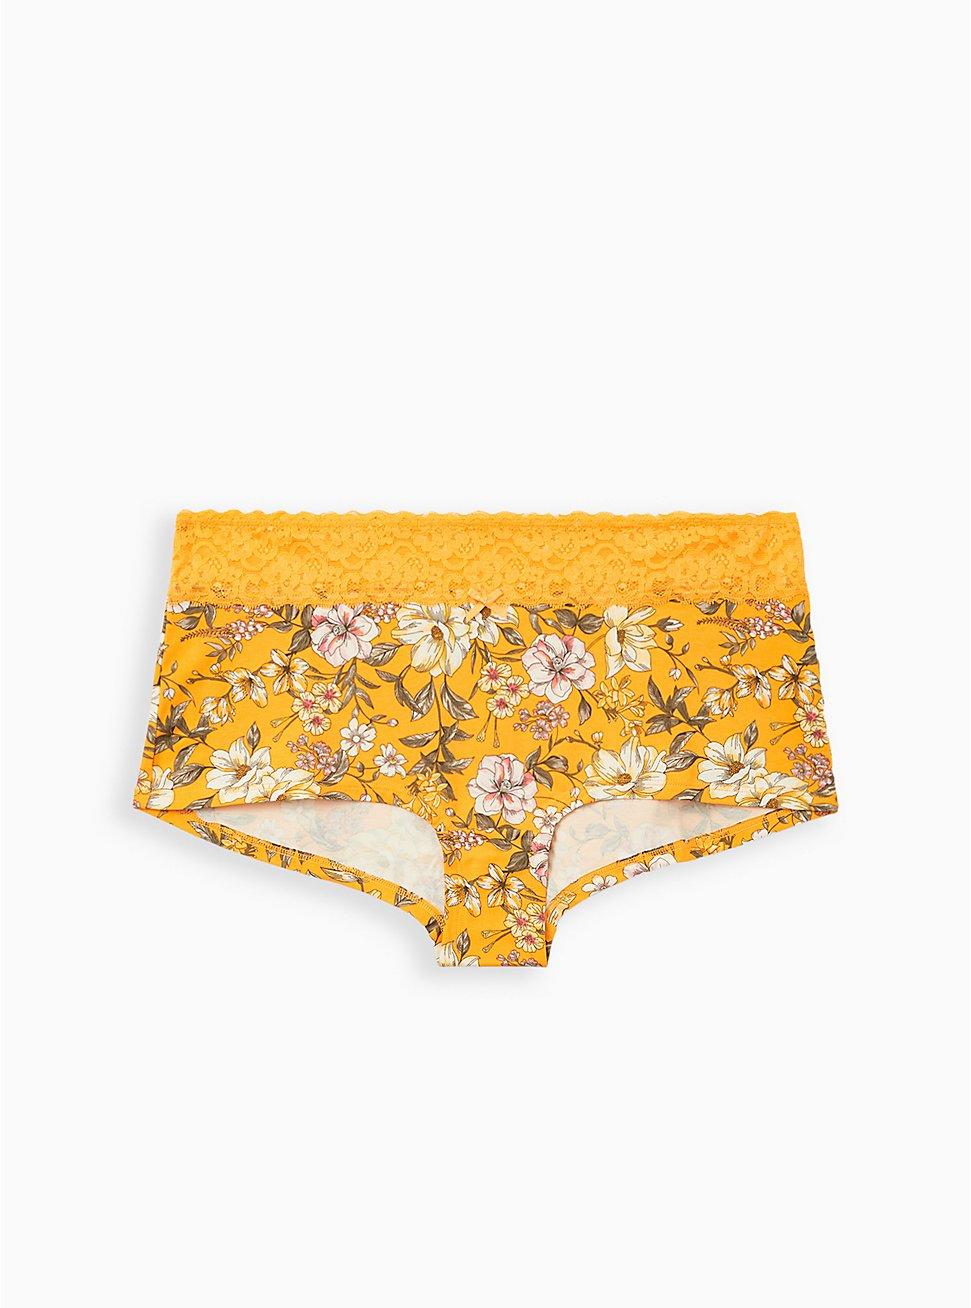 Yellow Floral Wide Lace Cotton Boyshort Panty, Trish Floral- YELLOW, hi-res